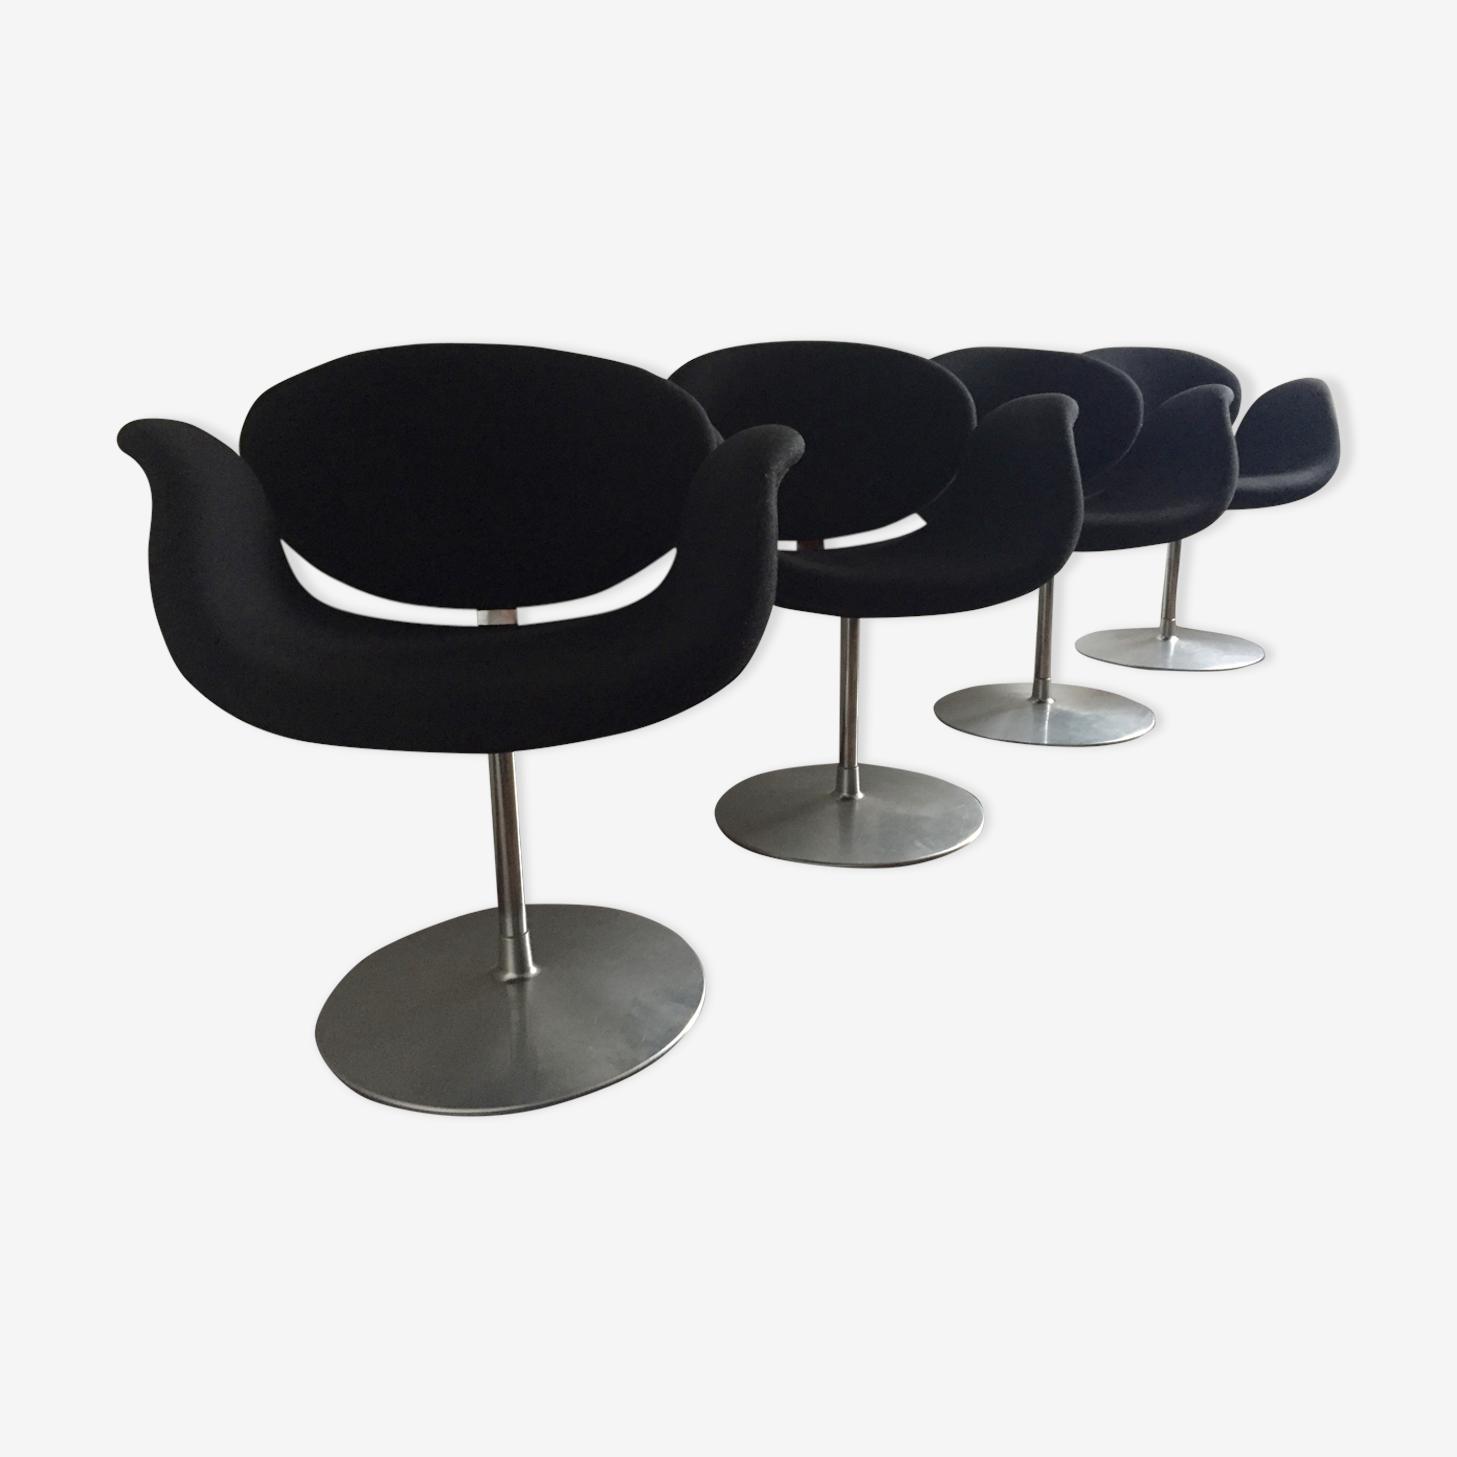 "Set of 4 armchairs ""little tulip"" by Pierre Paulin 1965"